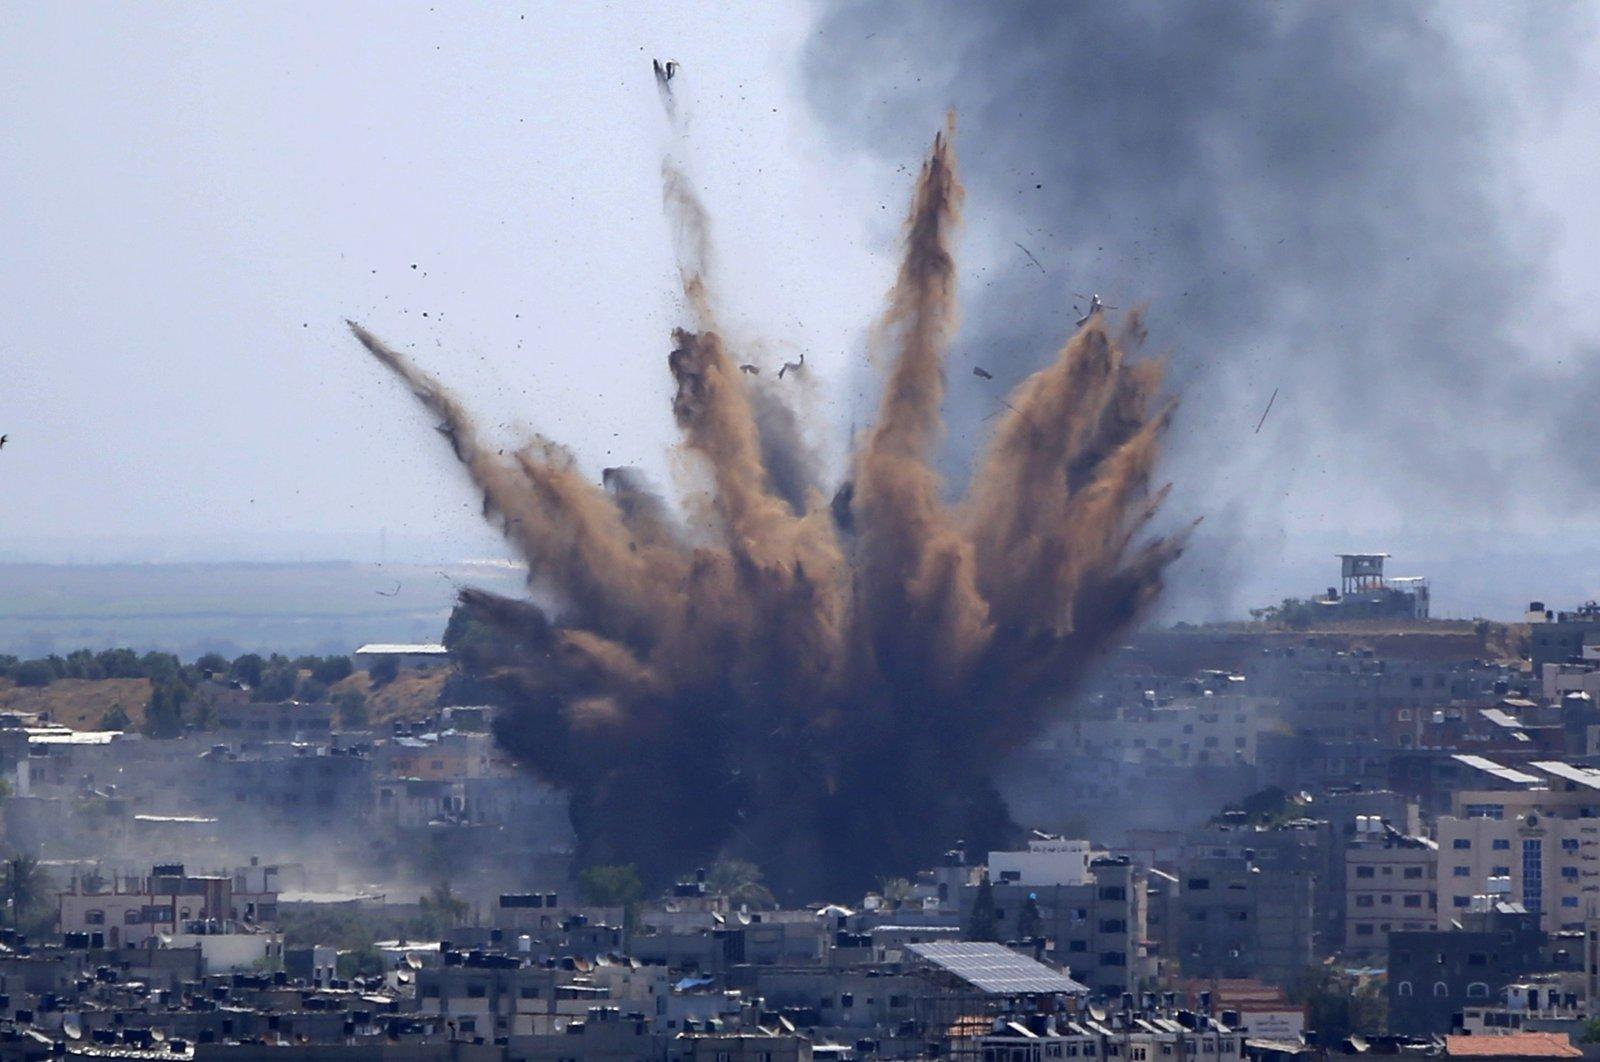 Smoke rises following Israeli airstrikes on a building in Gaza City, the Gaza Strip, Palestine, May 13, 2021. (AP Photo)